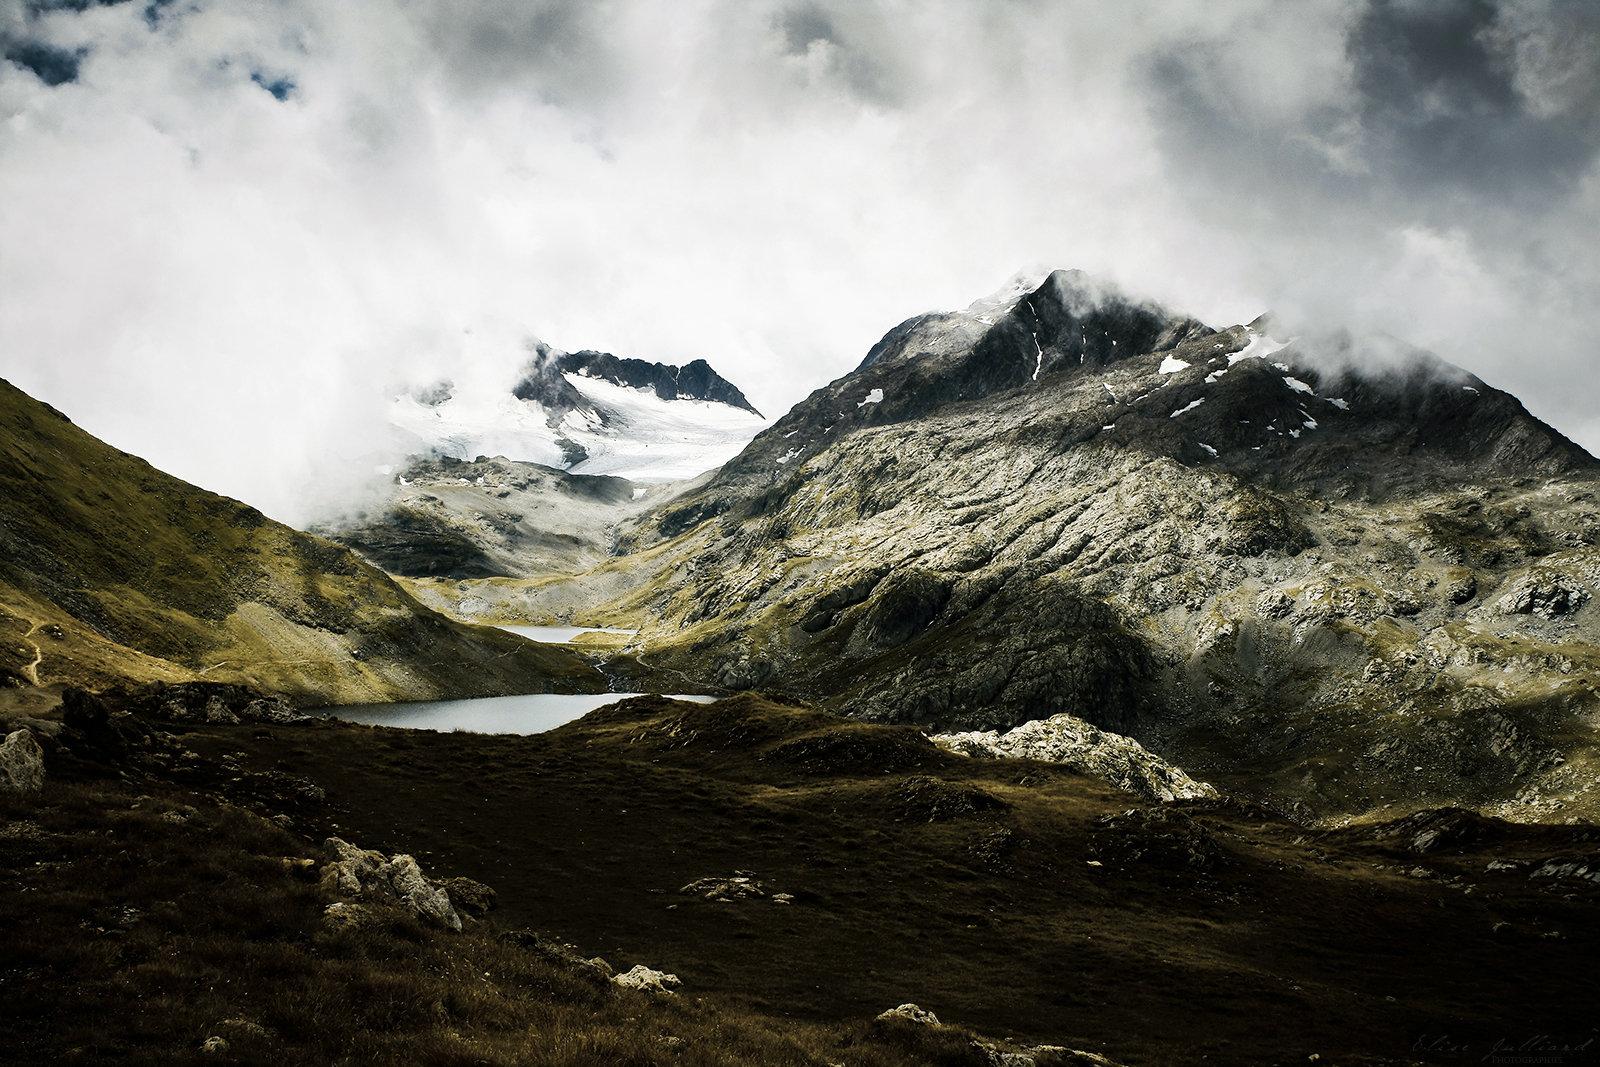 elise-julliard-photographe-photo-paysage-massif-des-grandes-rousses-savoie-etendard